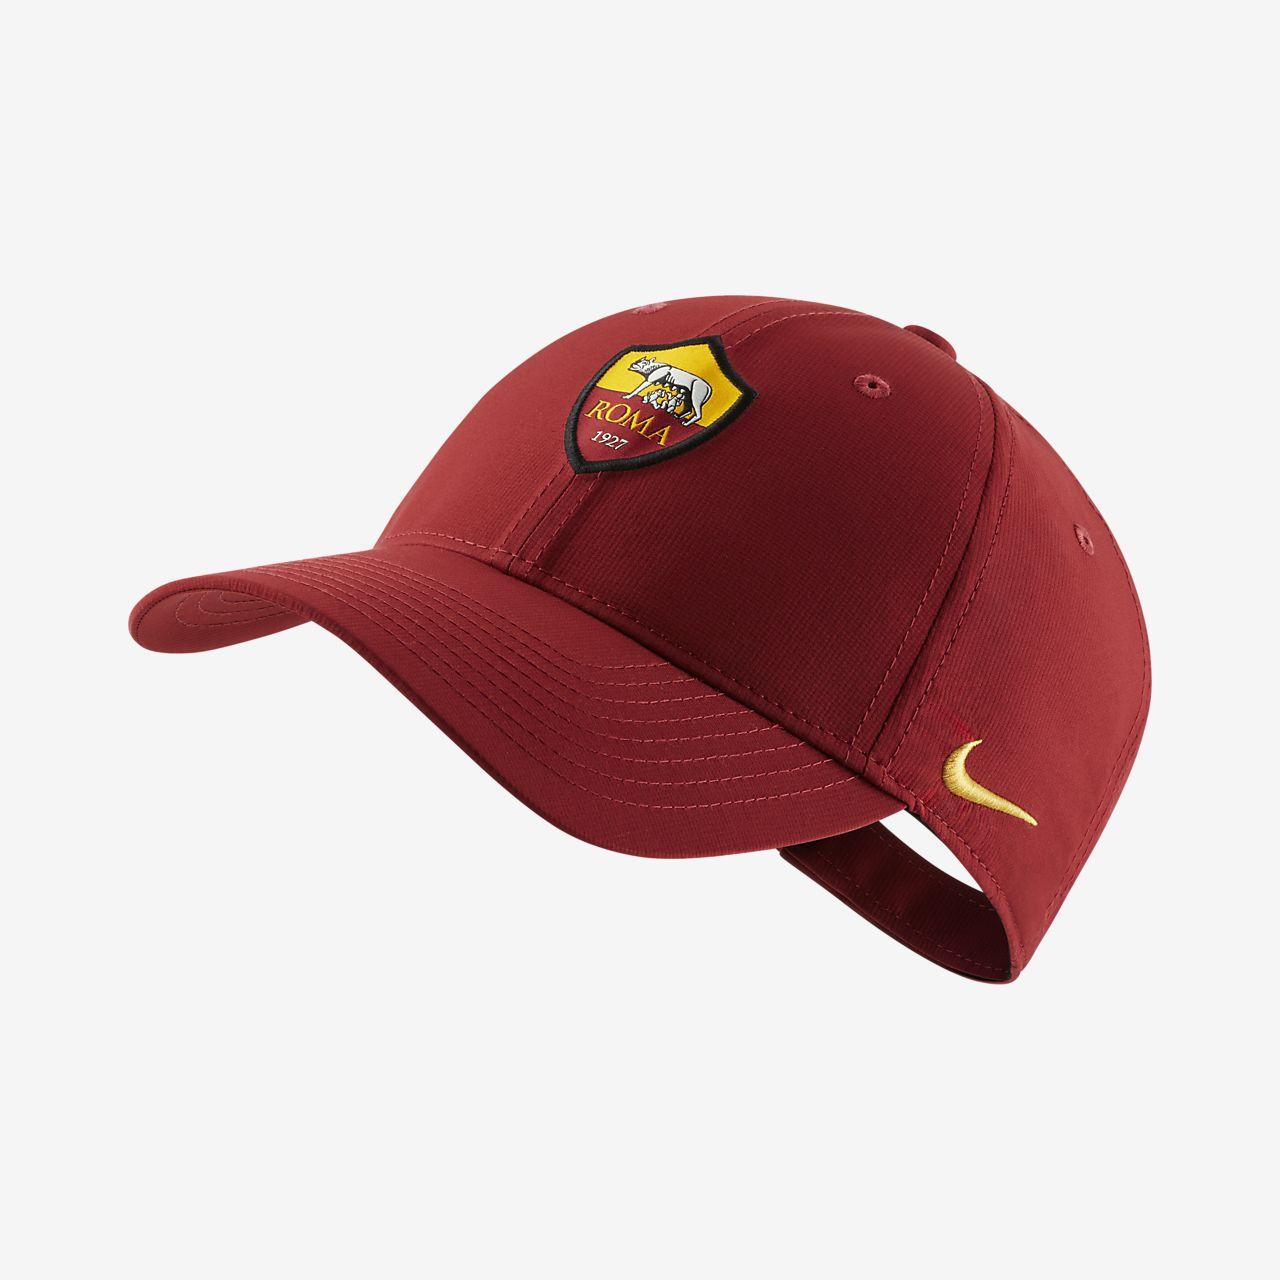 Cappello regolabile Nike Dri-FIT A.S. Roma Legacy91